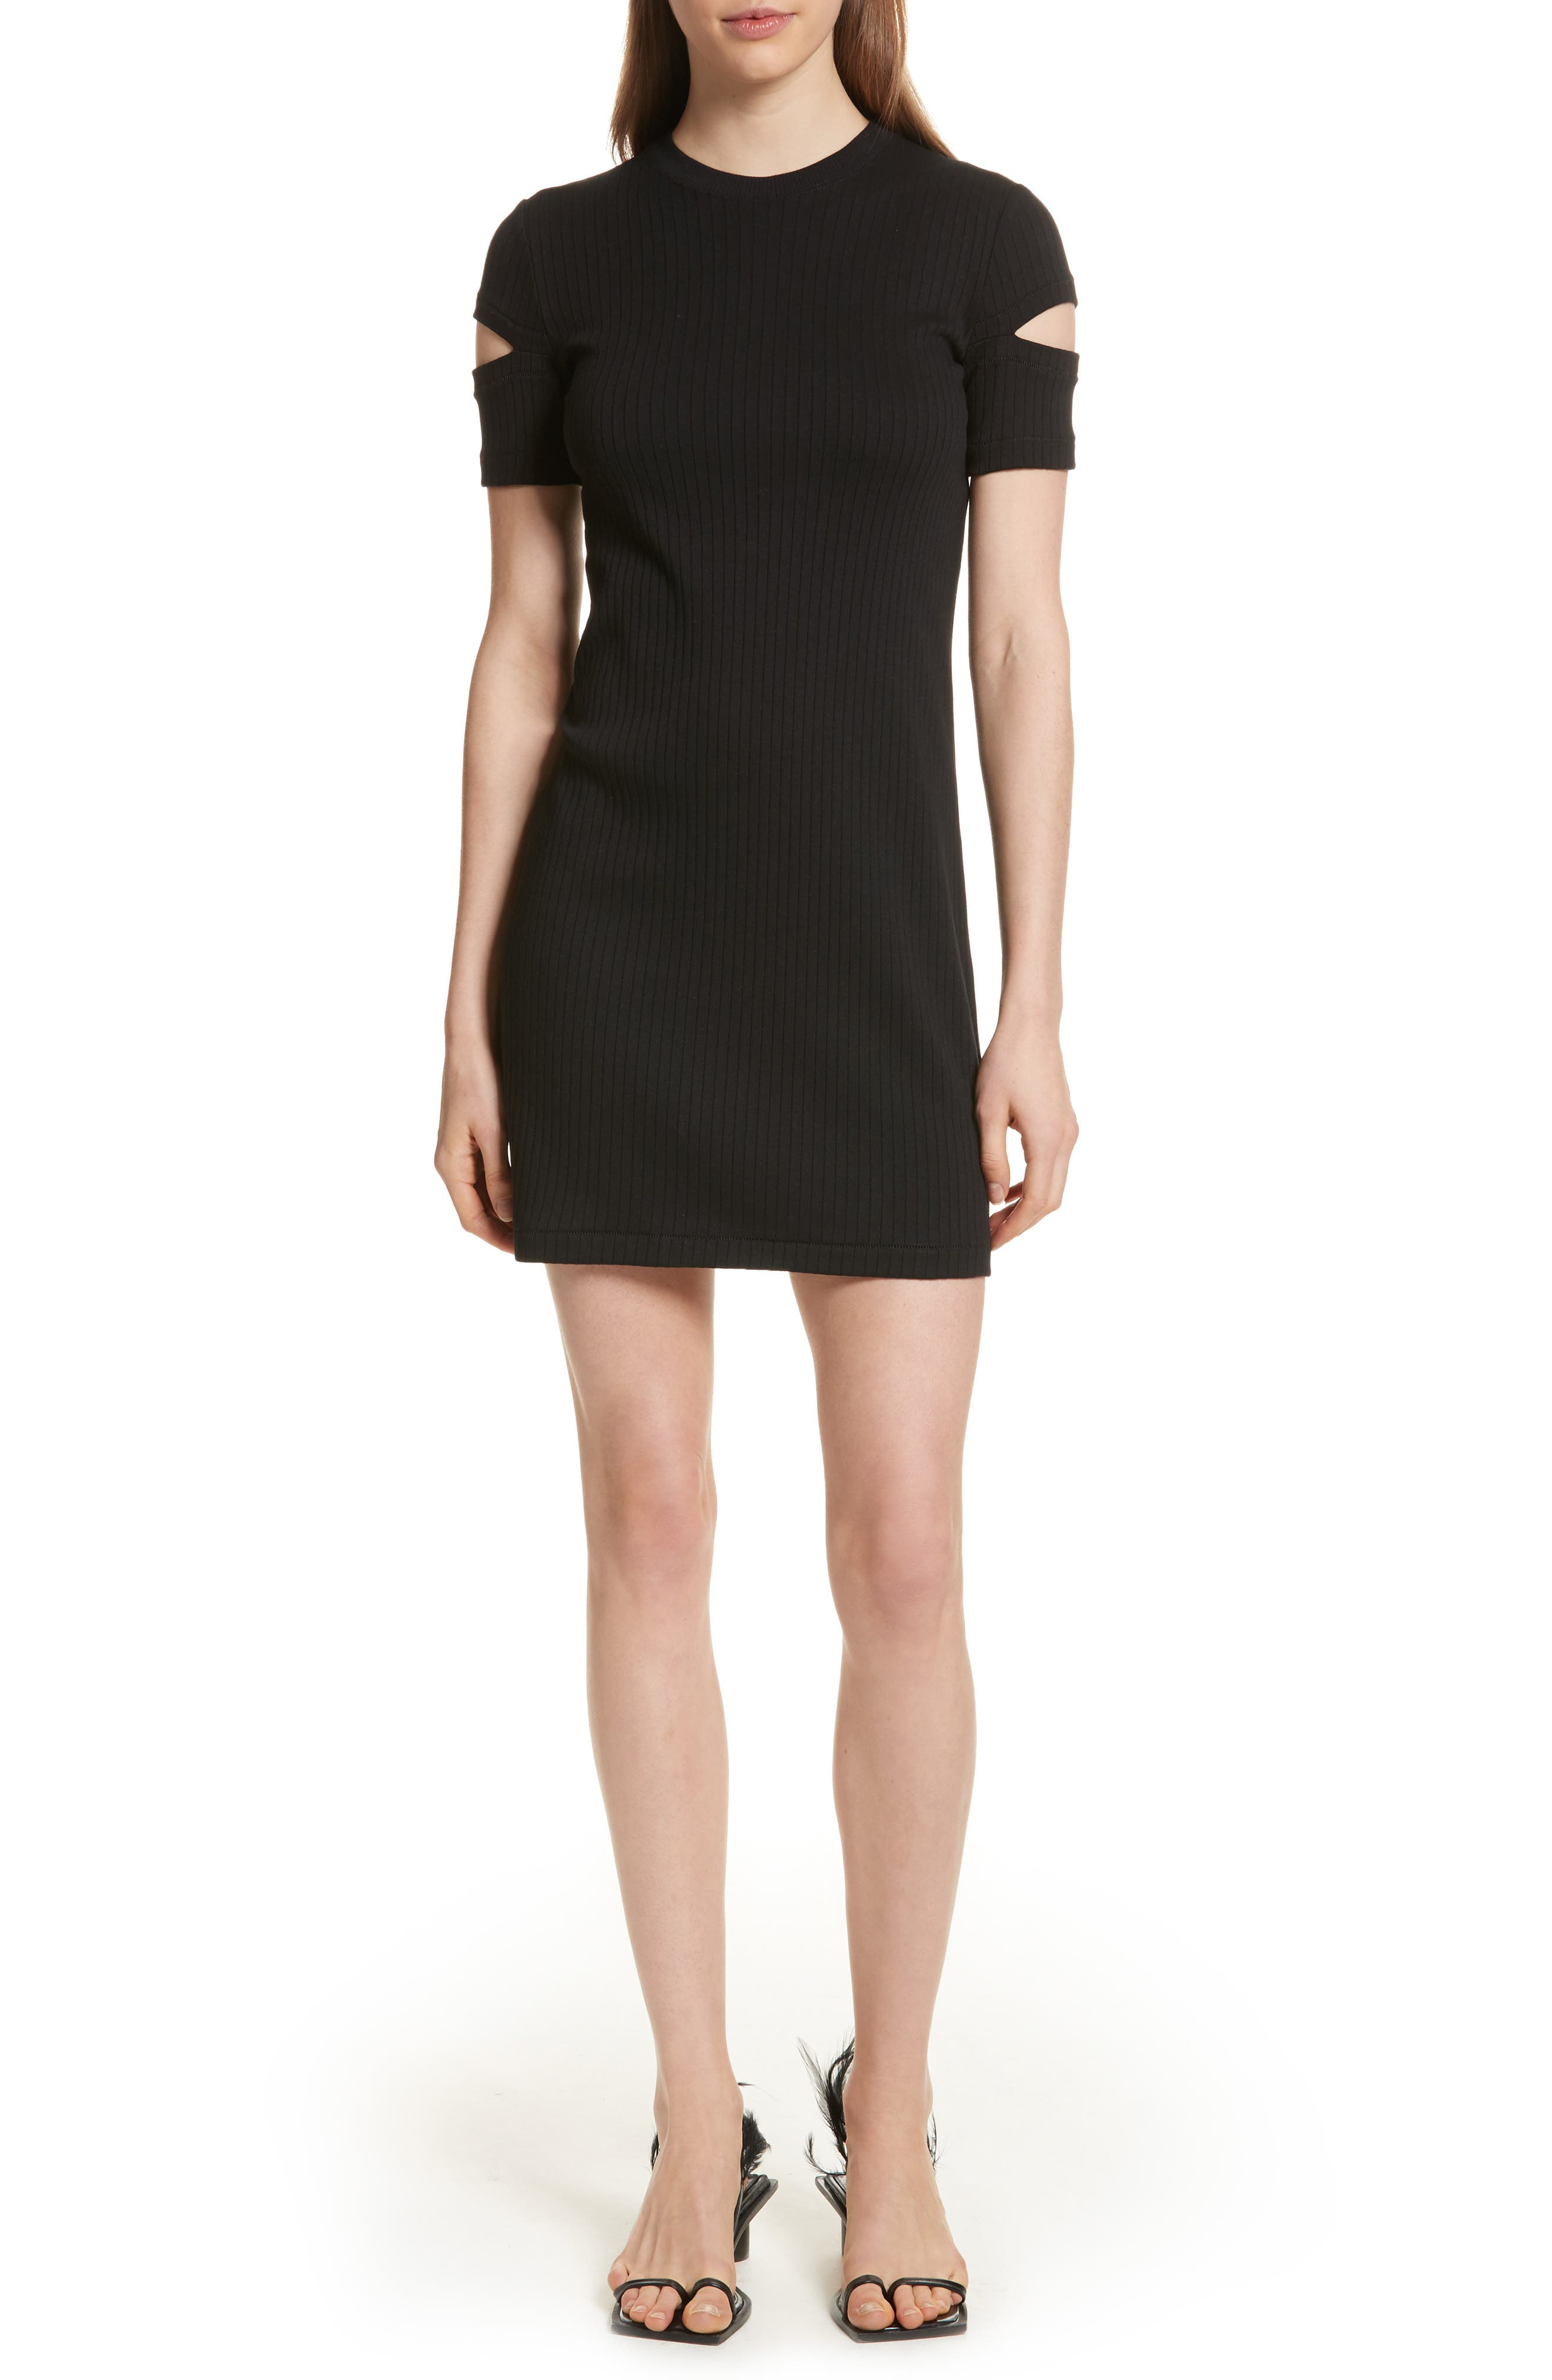 HELMUT LANG, Ribbed Slash Sleeve Dress, Main thumbnail 1, color, BLACK